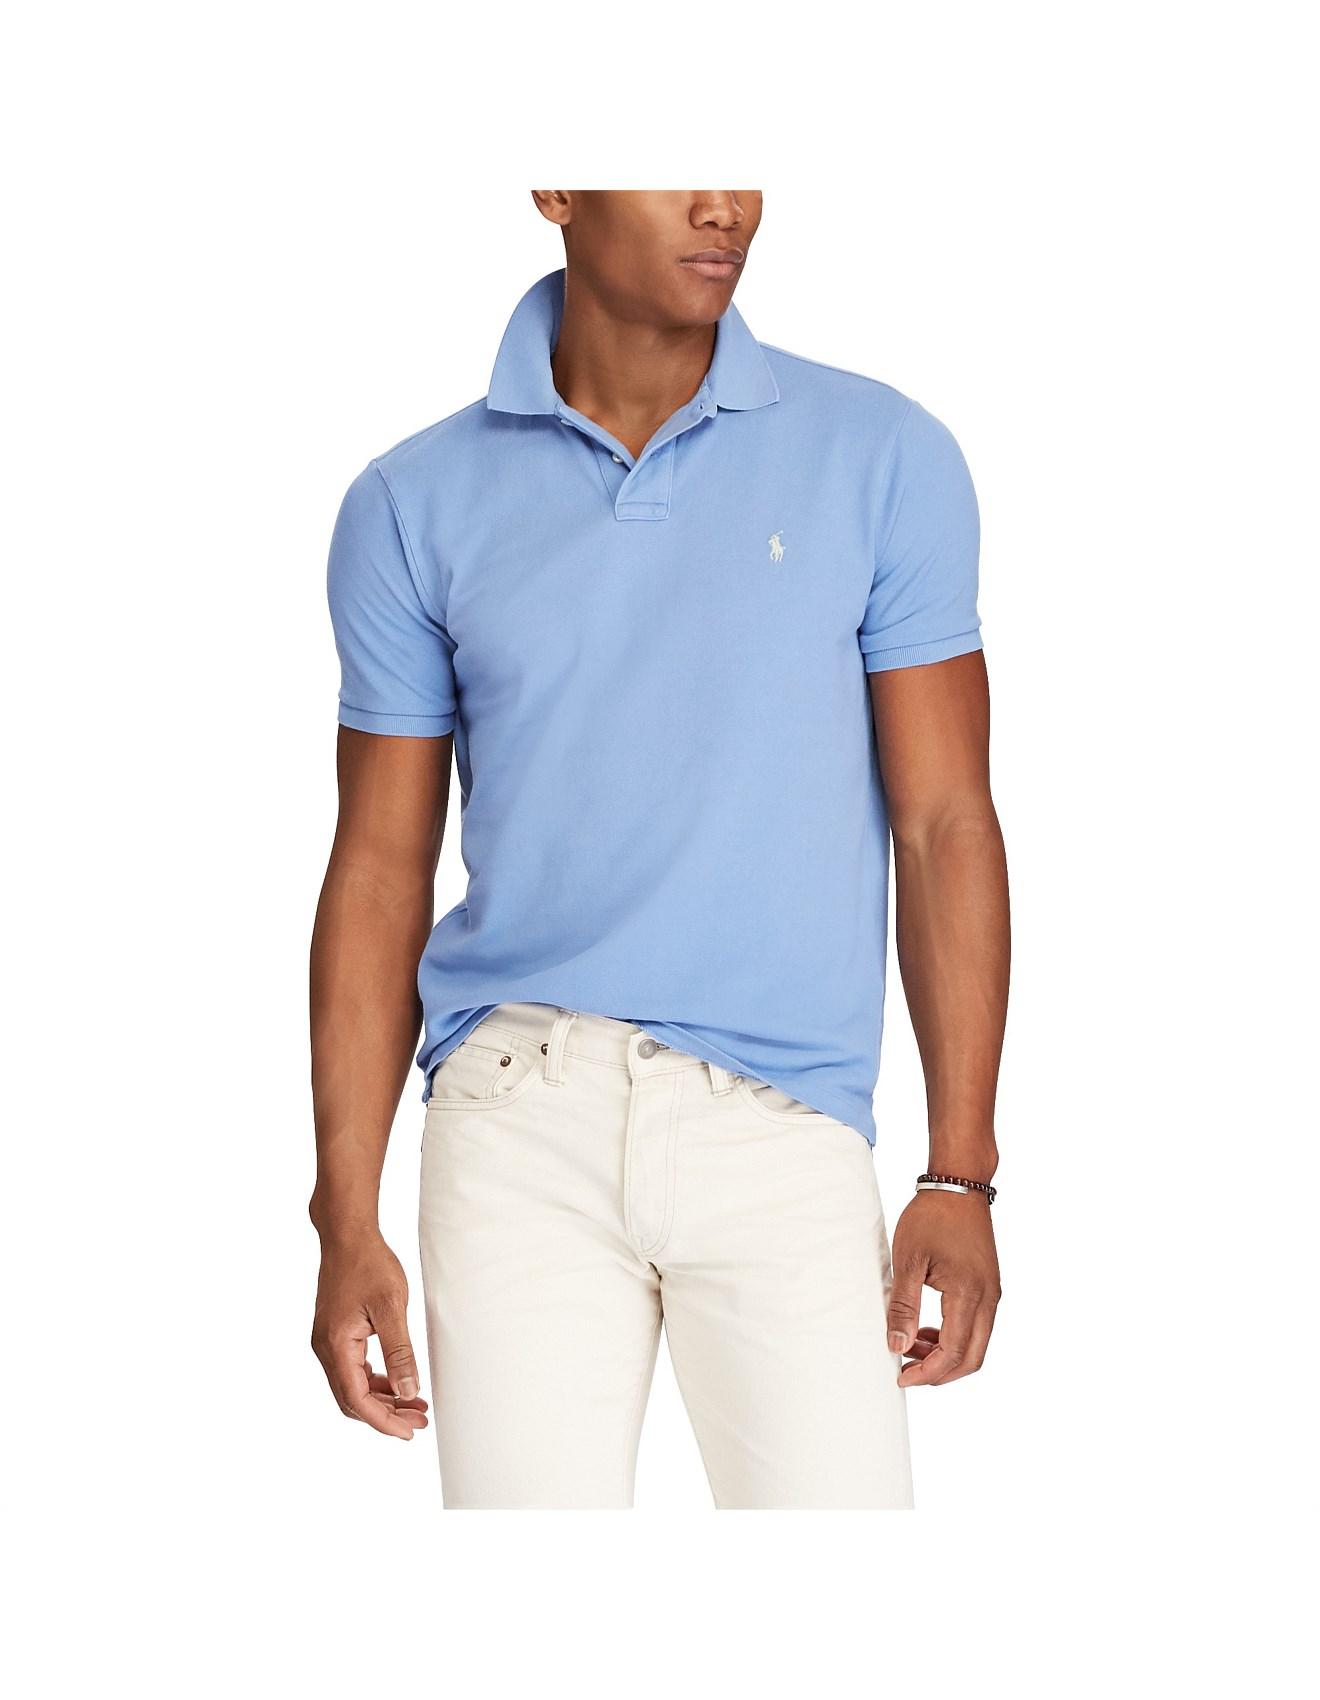 c2e03331 Polo Shirts - Men's Custom Slim Fit Mesh Polo